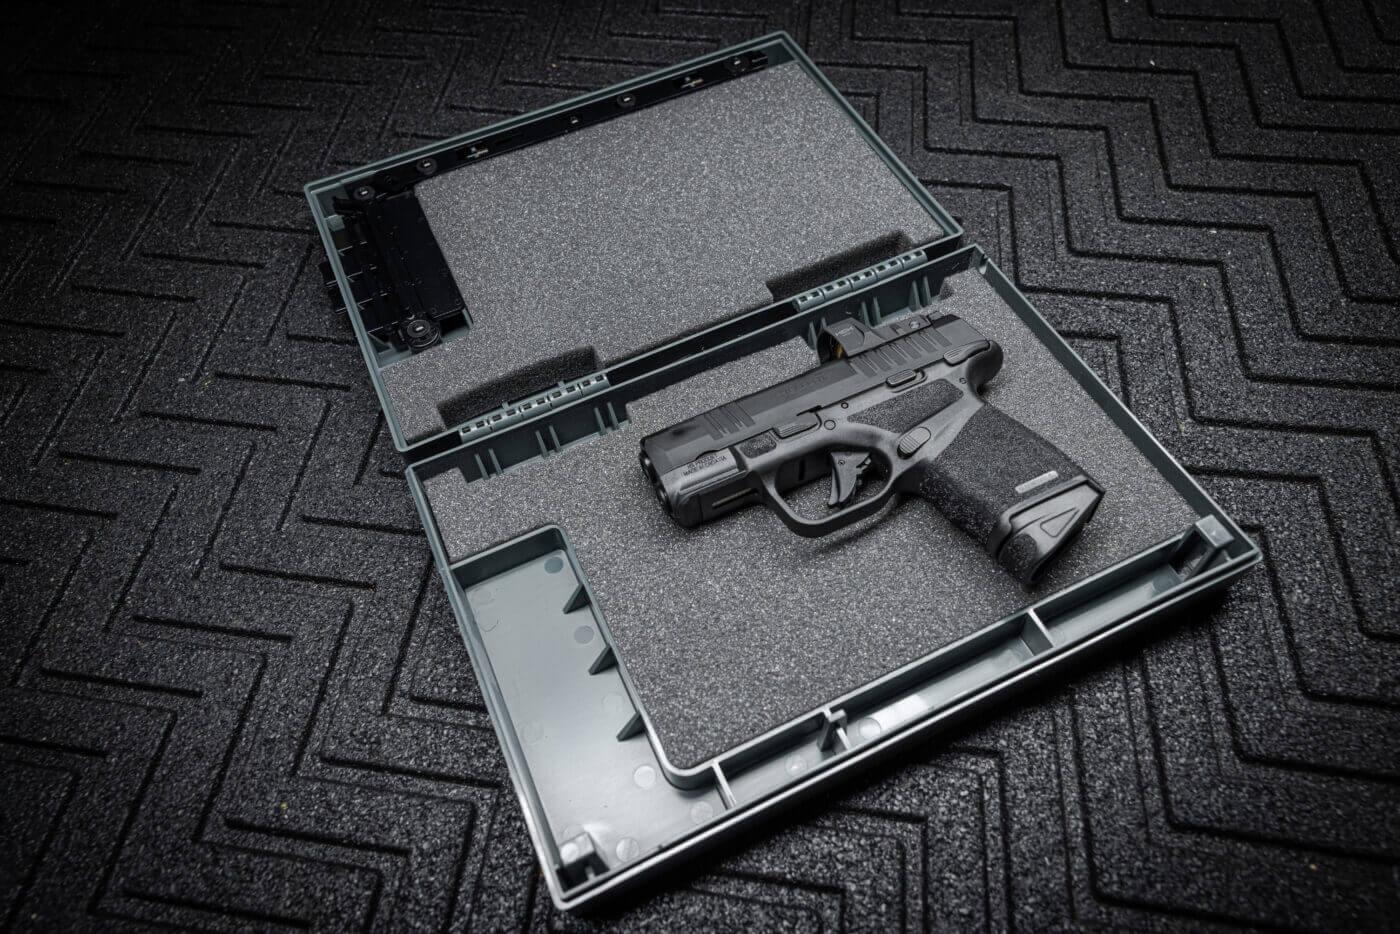 StopBox gun safe